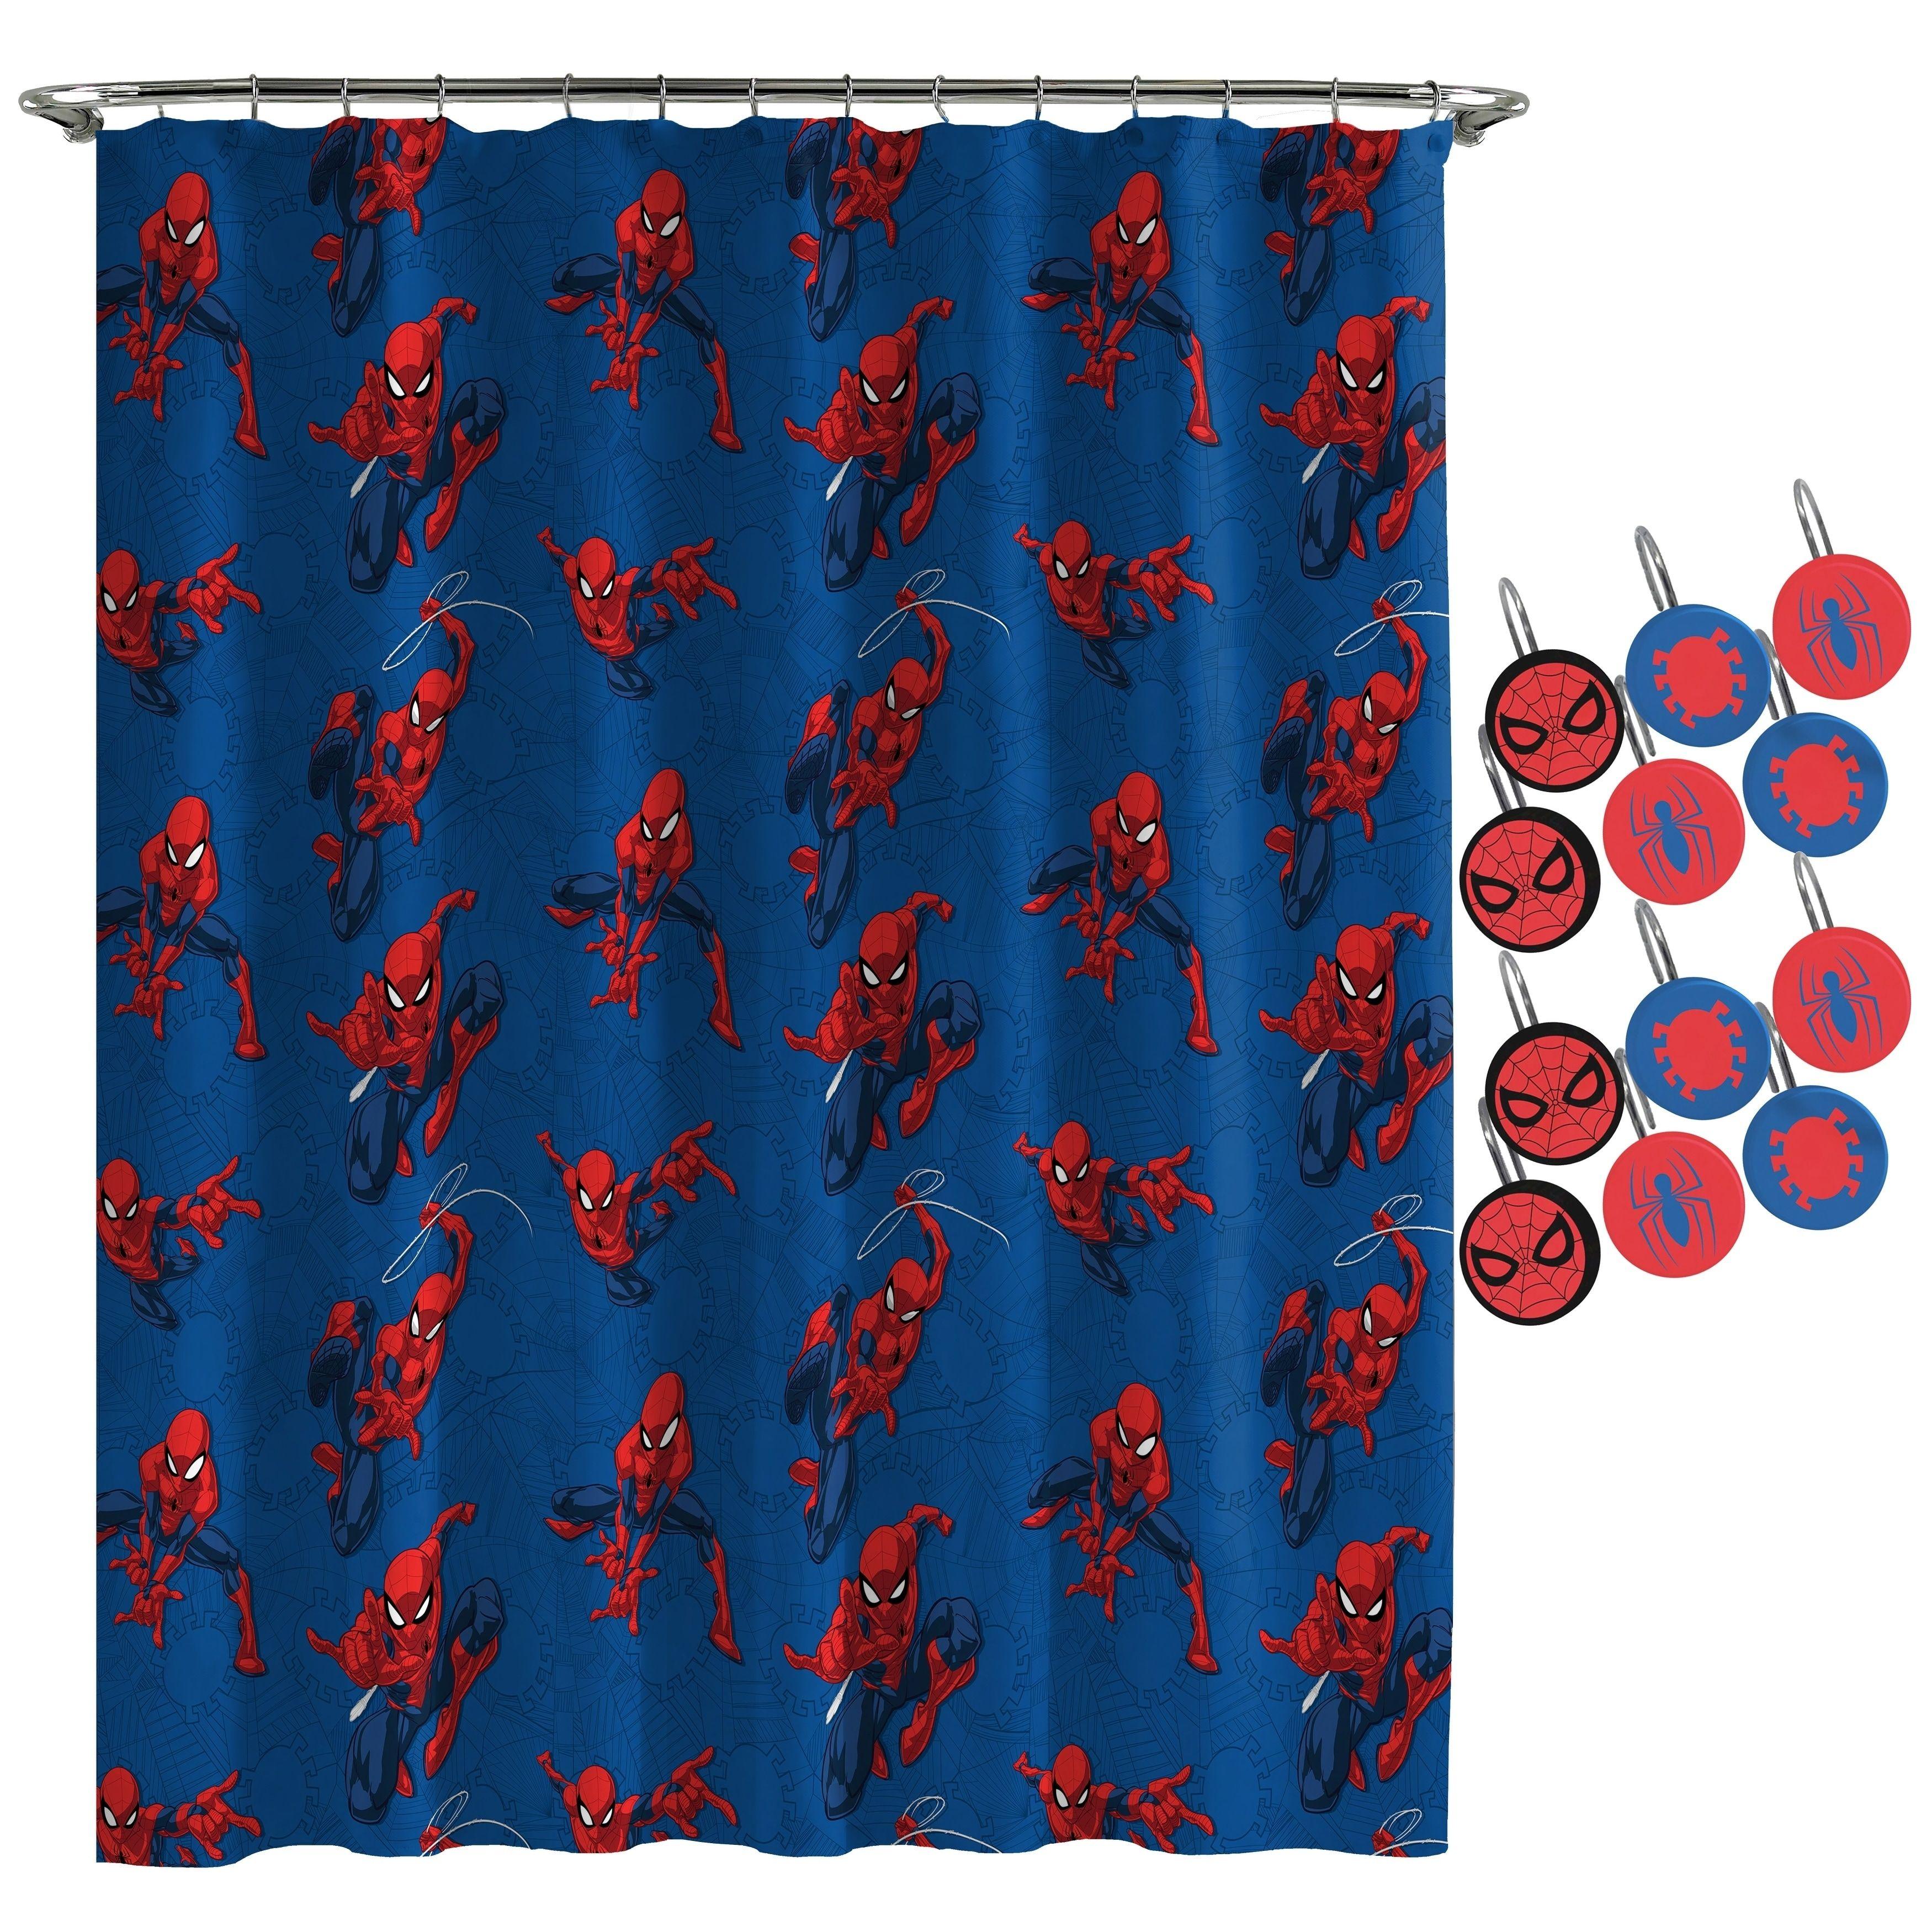 Spiderman Spidey Crawl Shower Curtain And Hooks Marvel